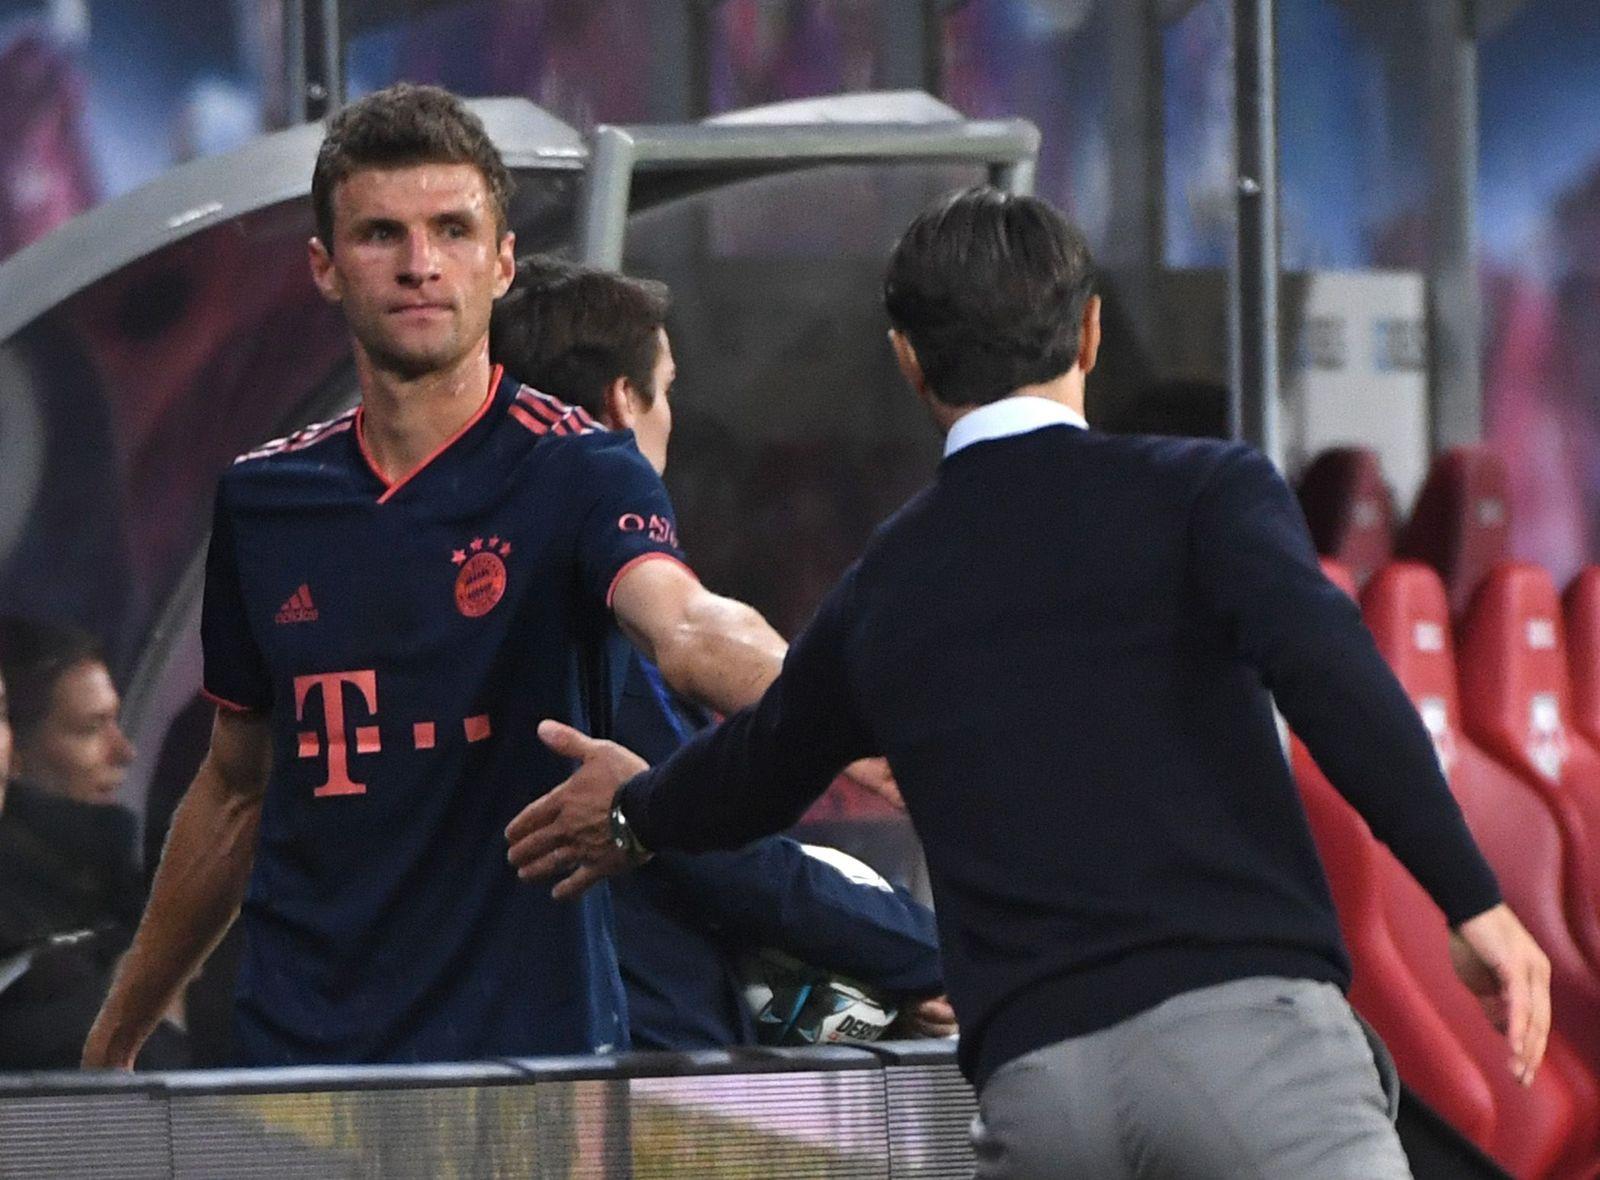 Identifikationsfigur in «Not»-Situation - Spekulation um Müller